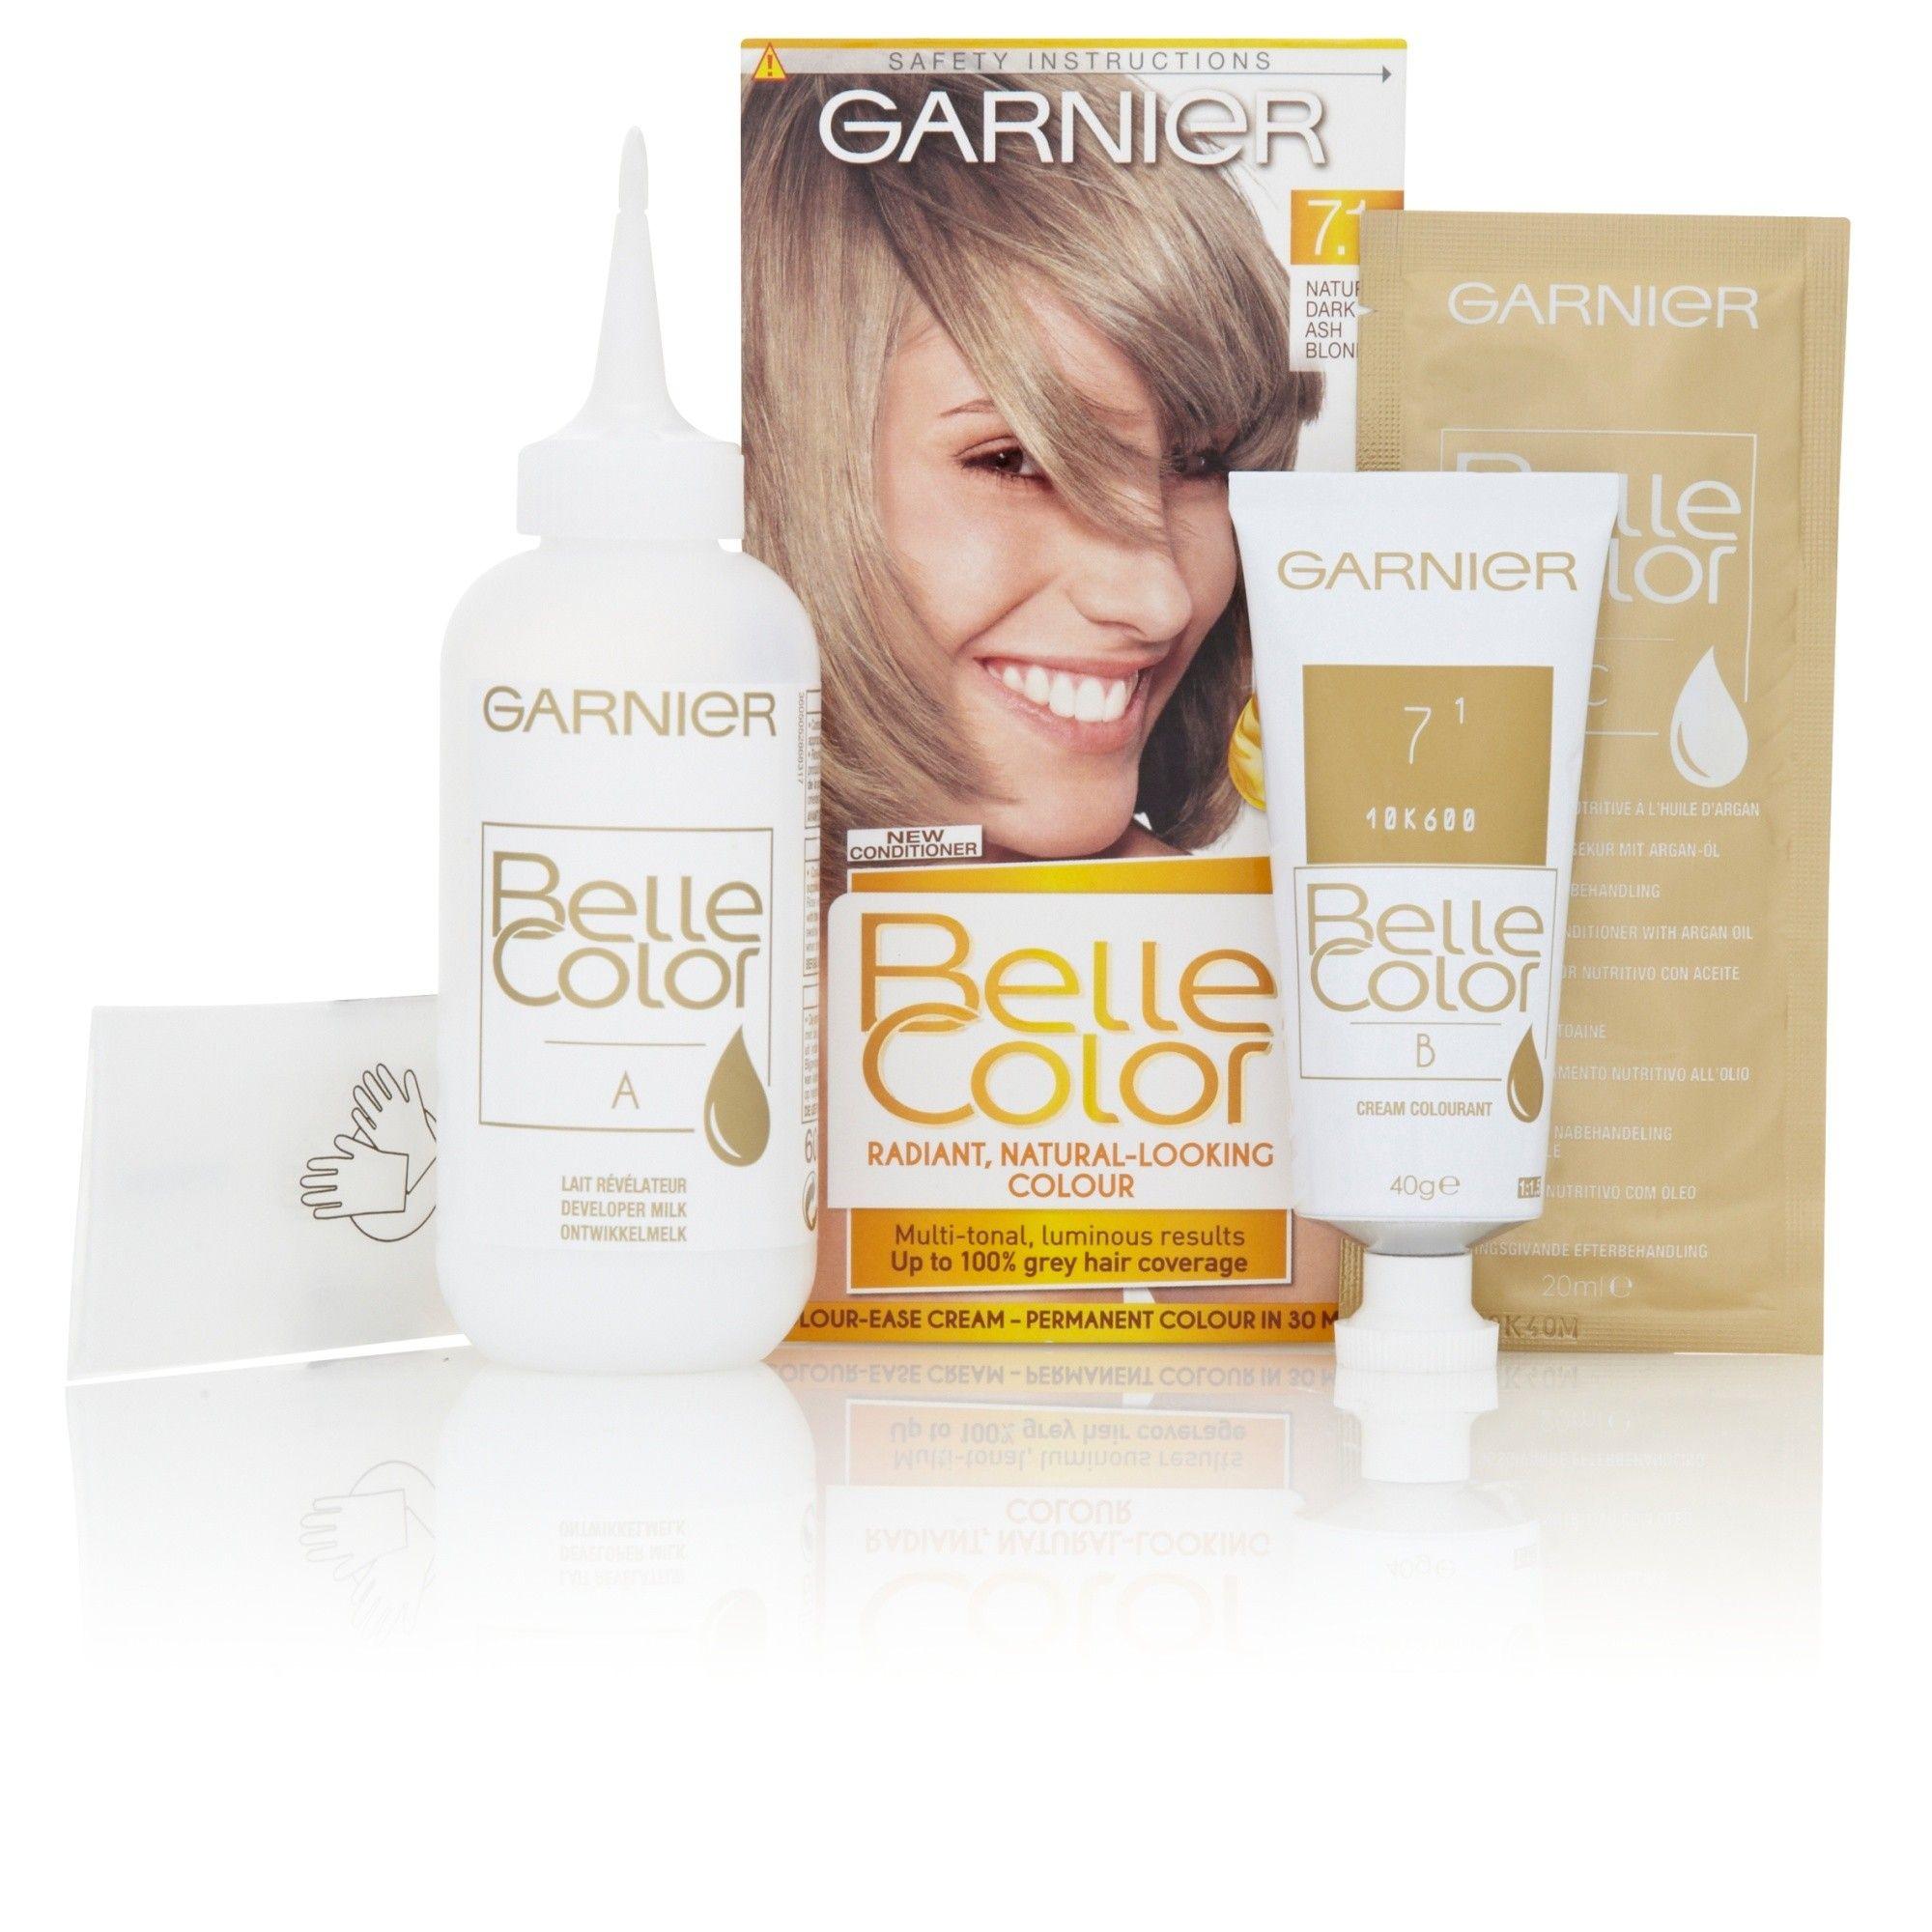 Garnier Belle Colour 7.1 Natural Dark Ash Blonde Hair Dye #naturalashblonde